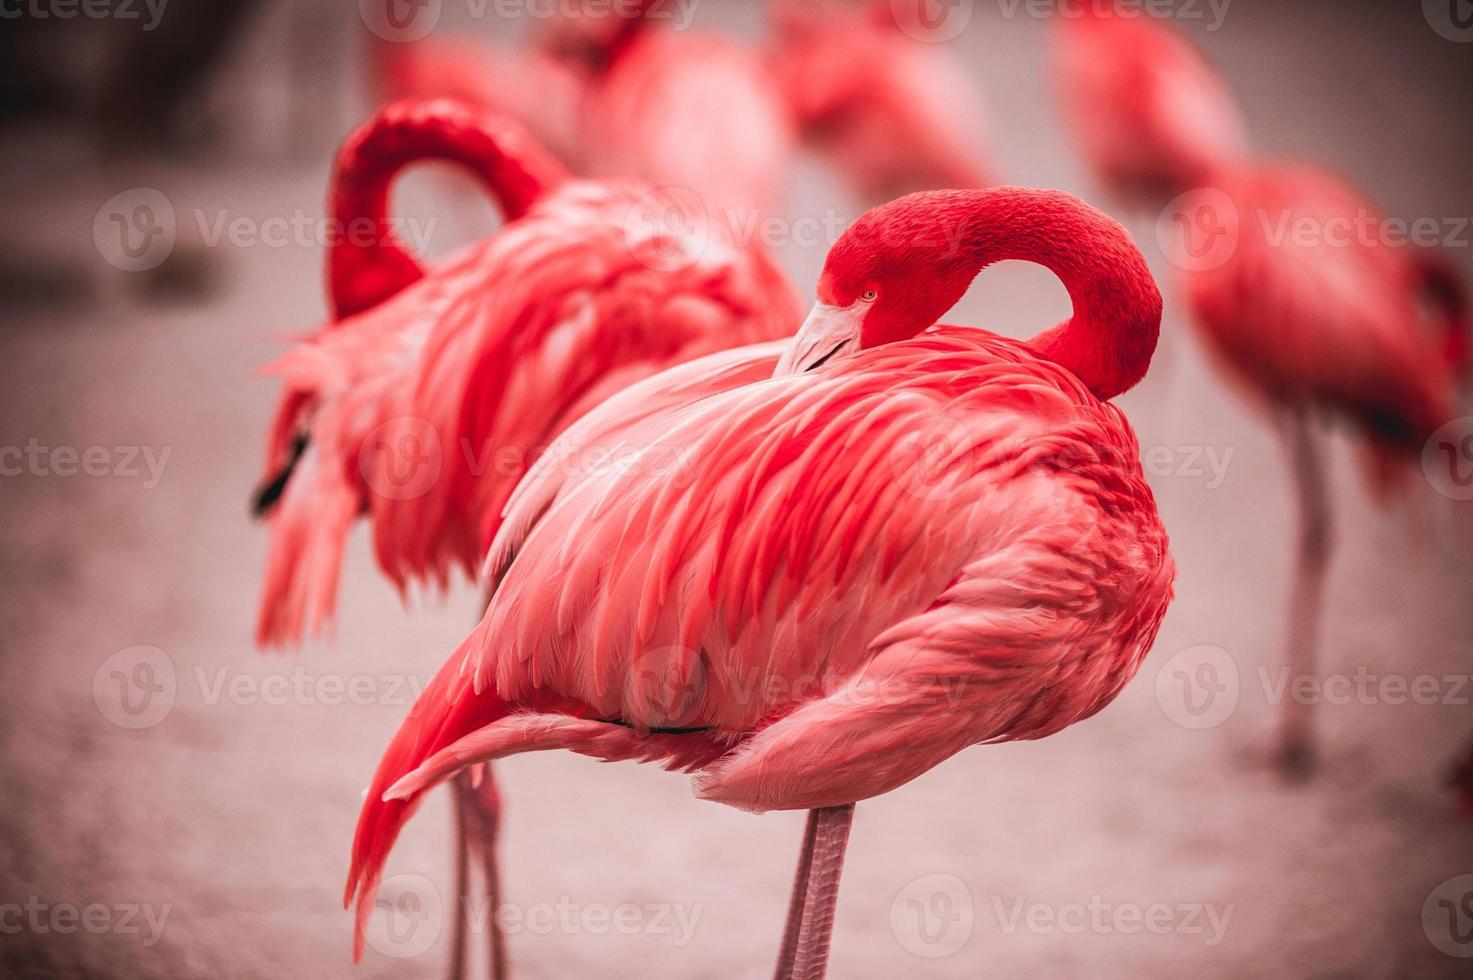 flamencos rosados contra el fondo verde foto